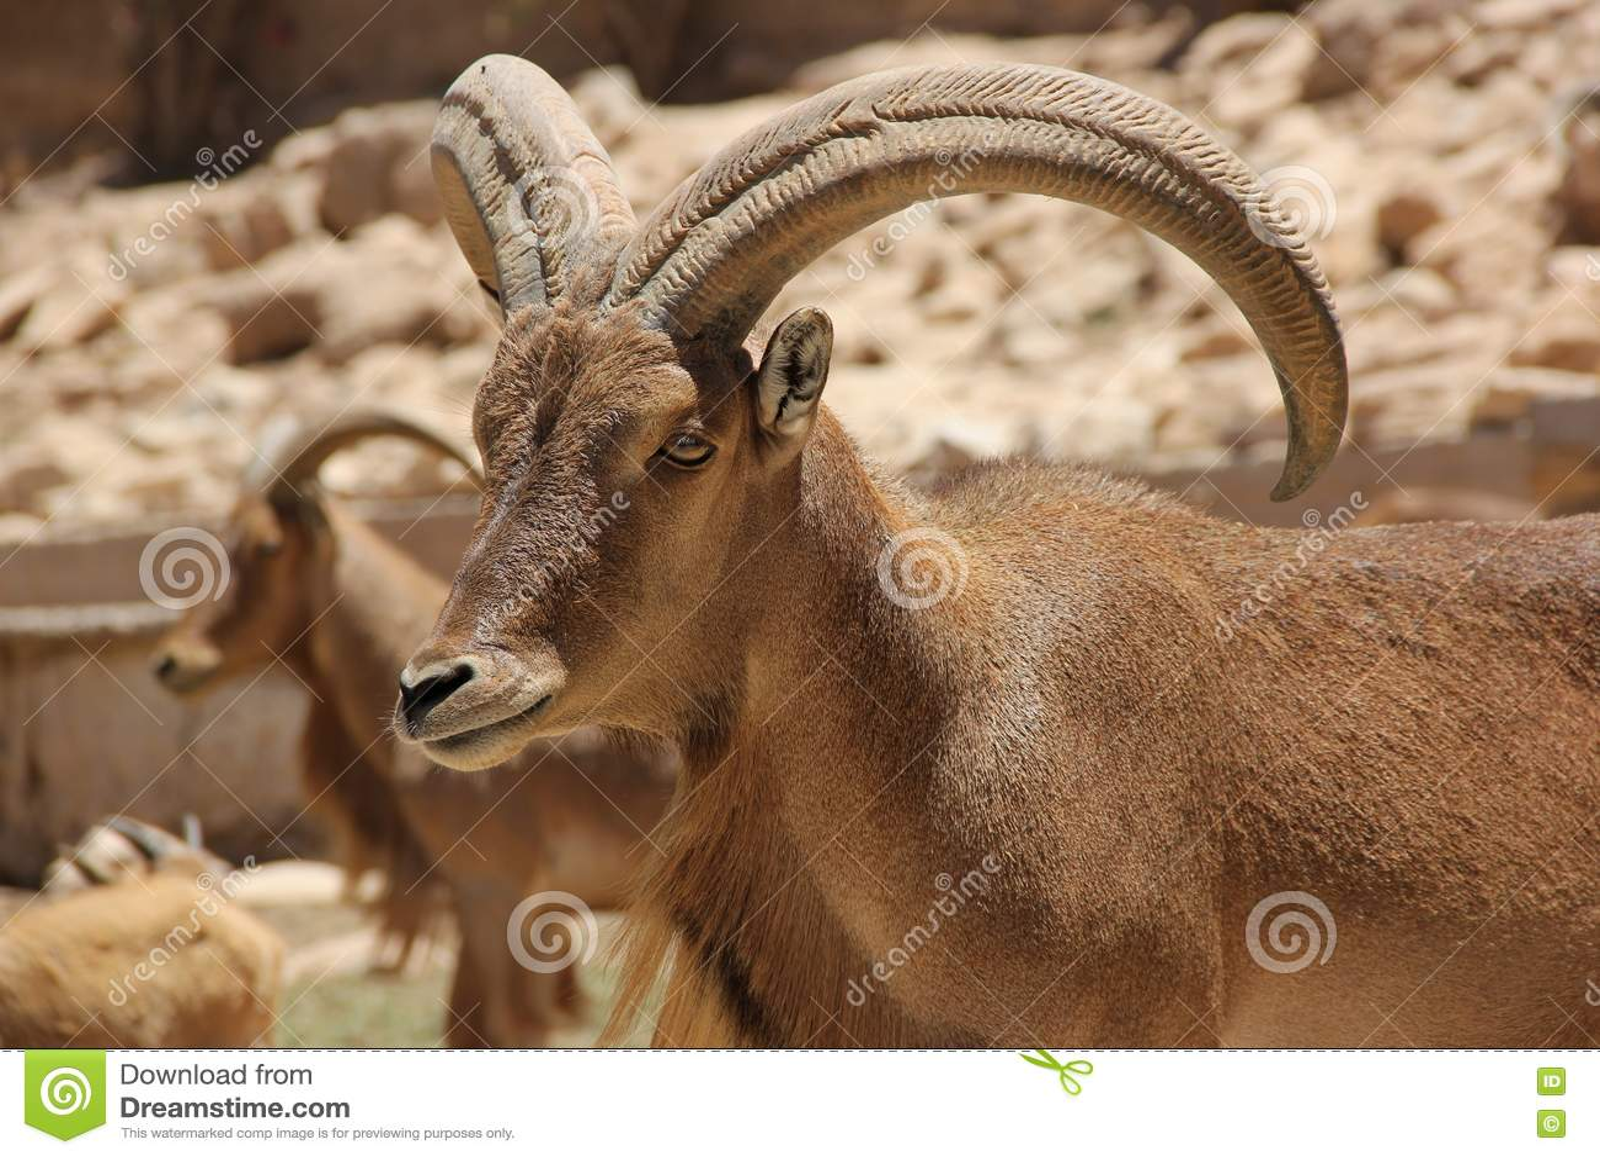 Download Barbary Sheep stock photo. Image of lervia, antelope - 76597242